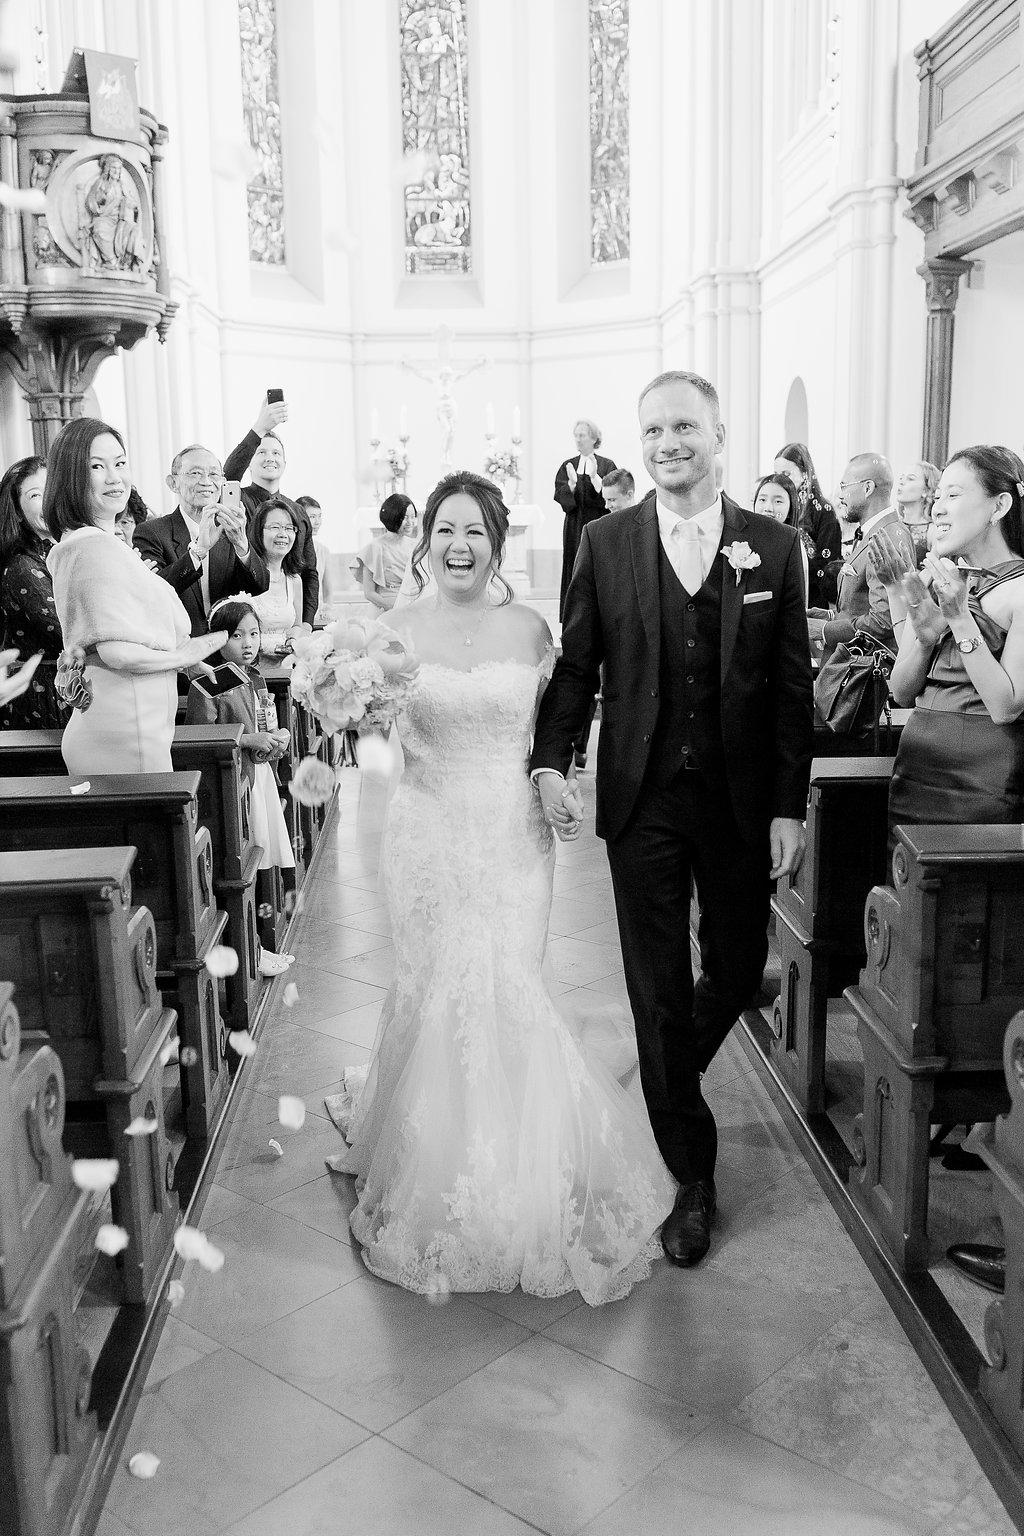 Luxe Navy and Pink Wedding at Schloss Fuschl in Austria by Tanja Kibogo19.JPG